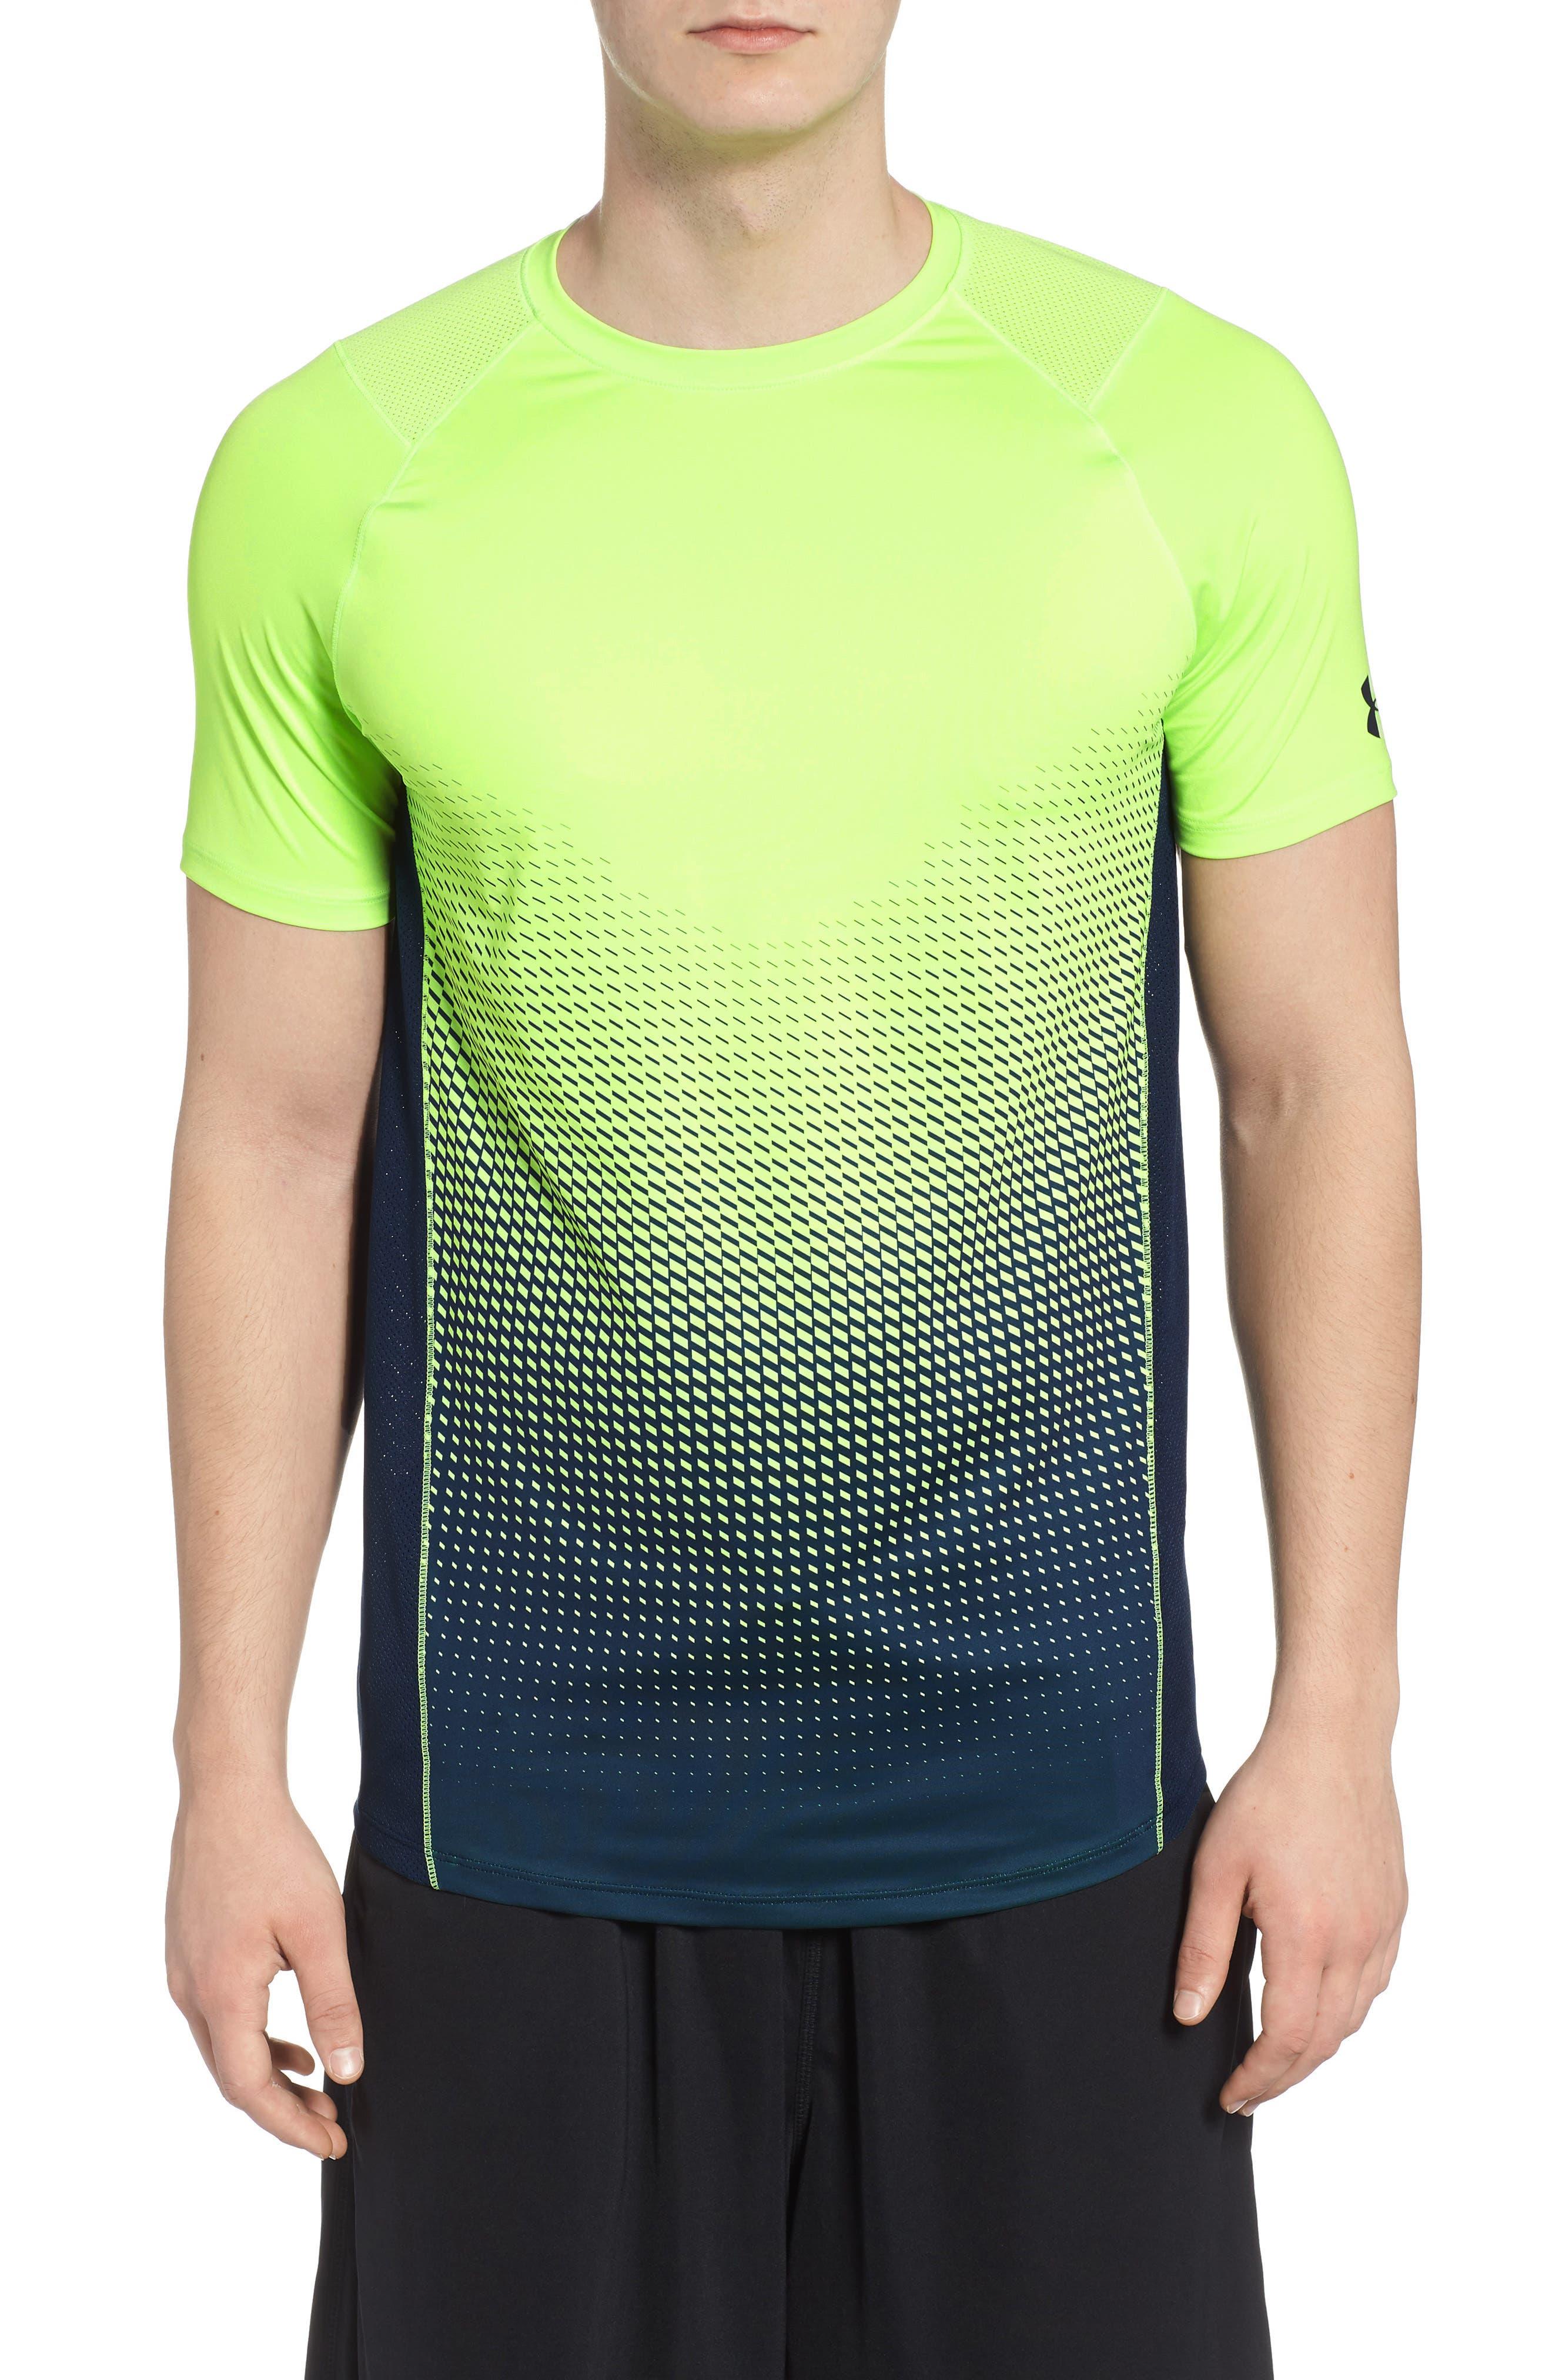 MK1 Dash Crewneck T-Shirt,                         Main,                         color, 312